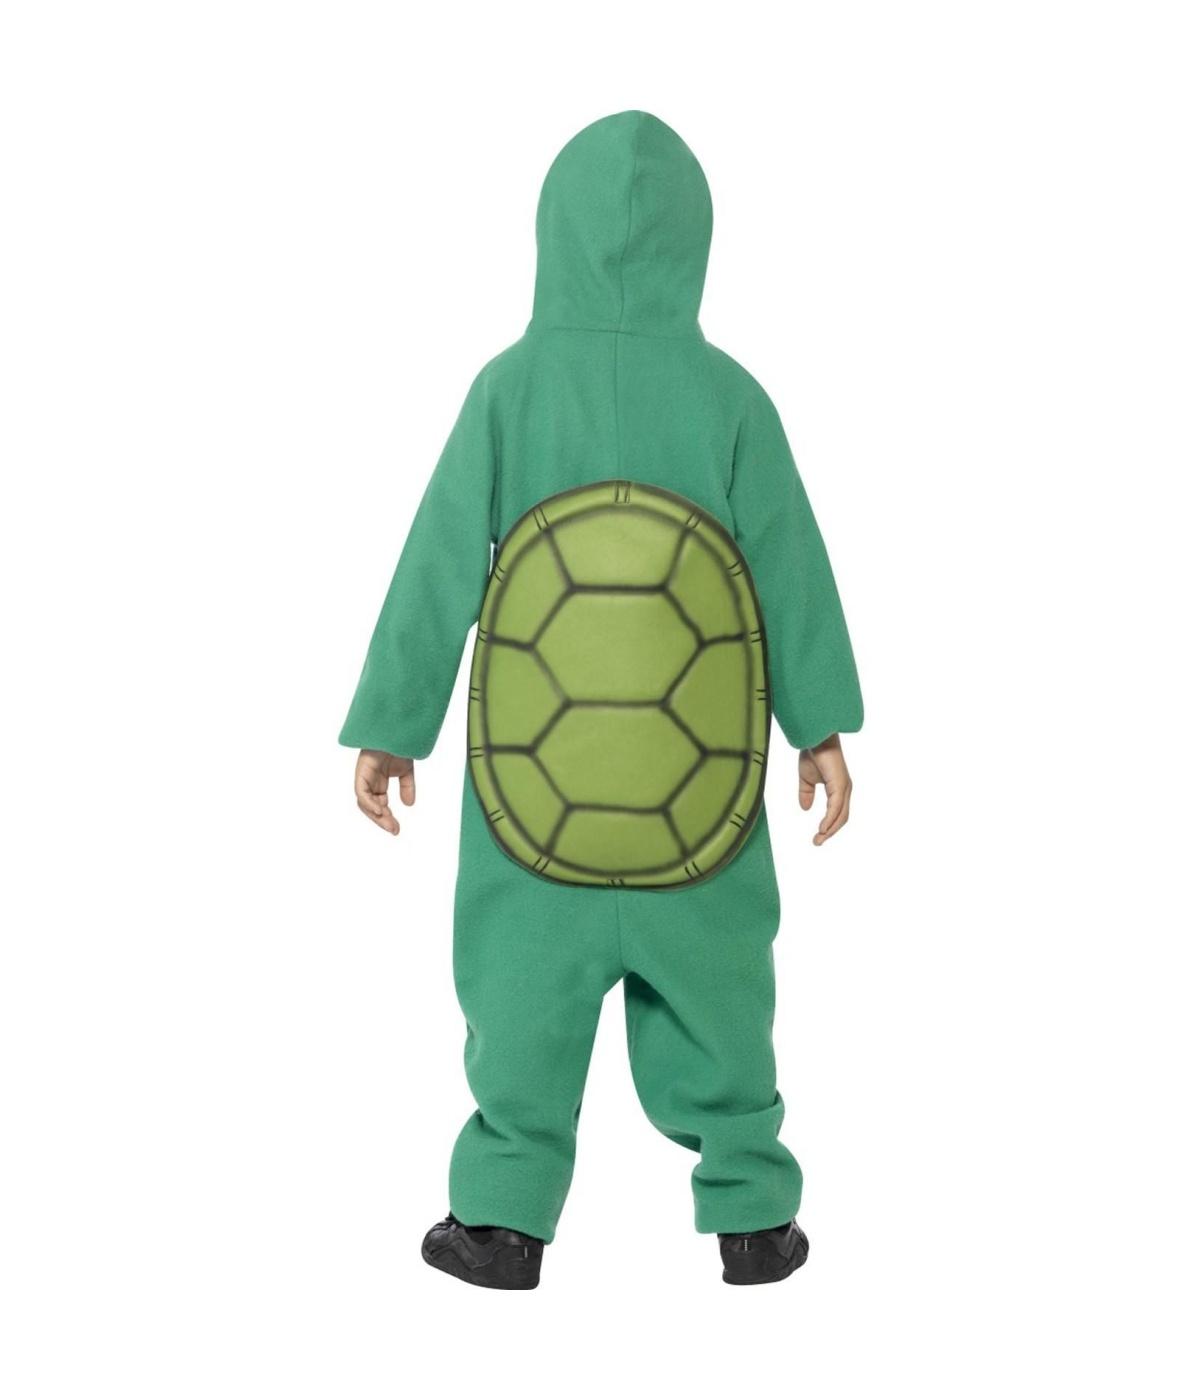 Turtle Boys Costume Animal Costumes